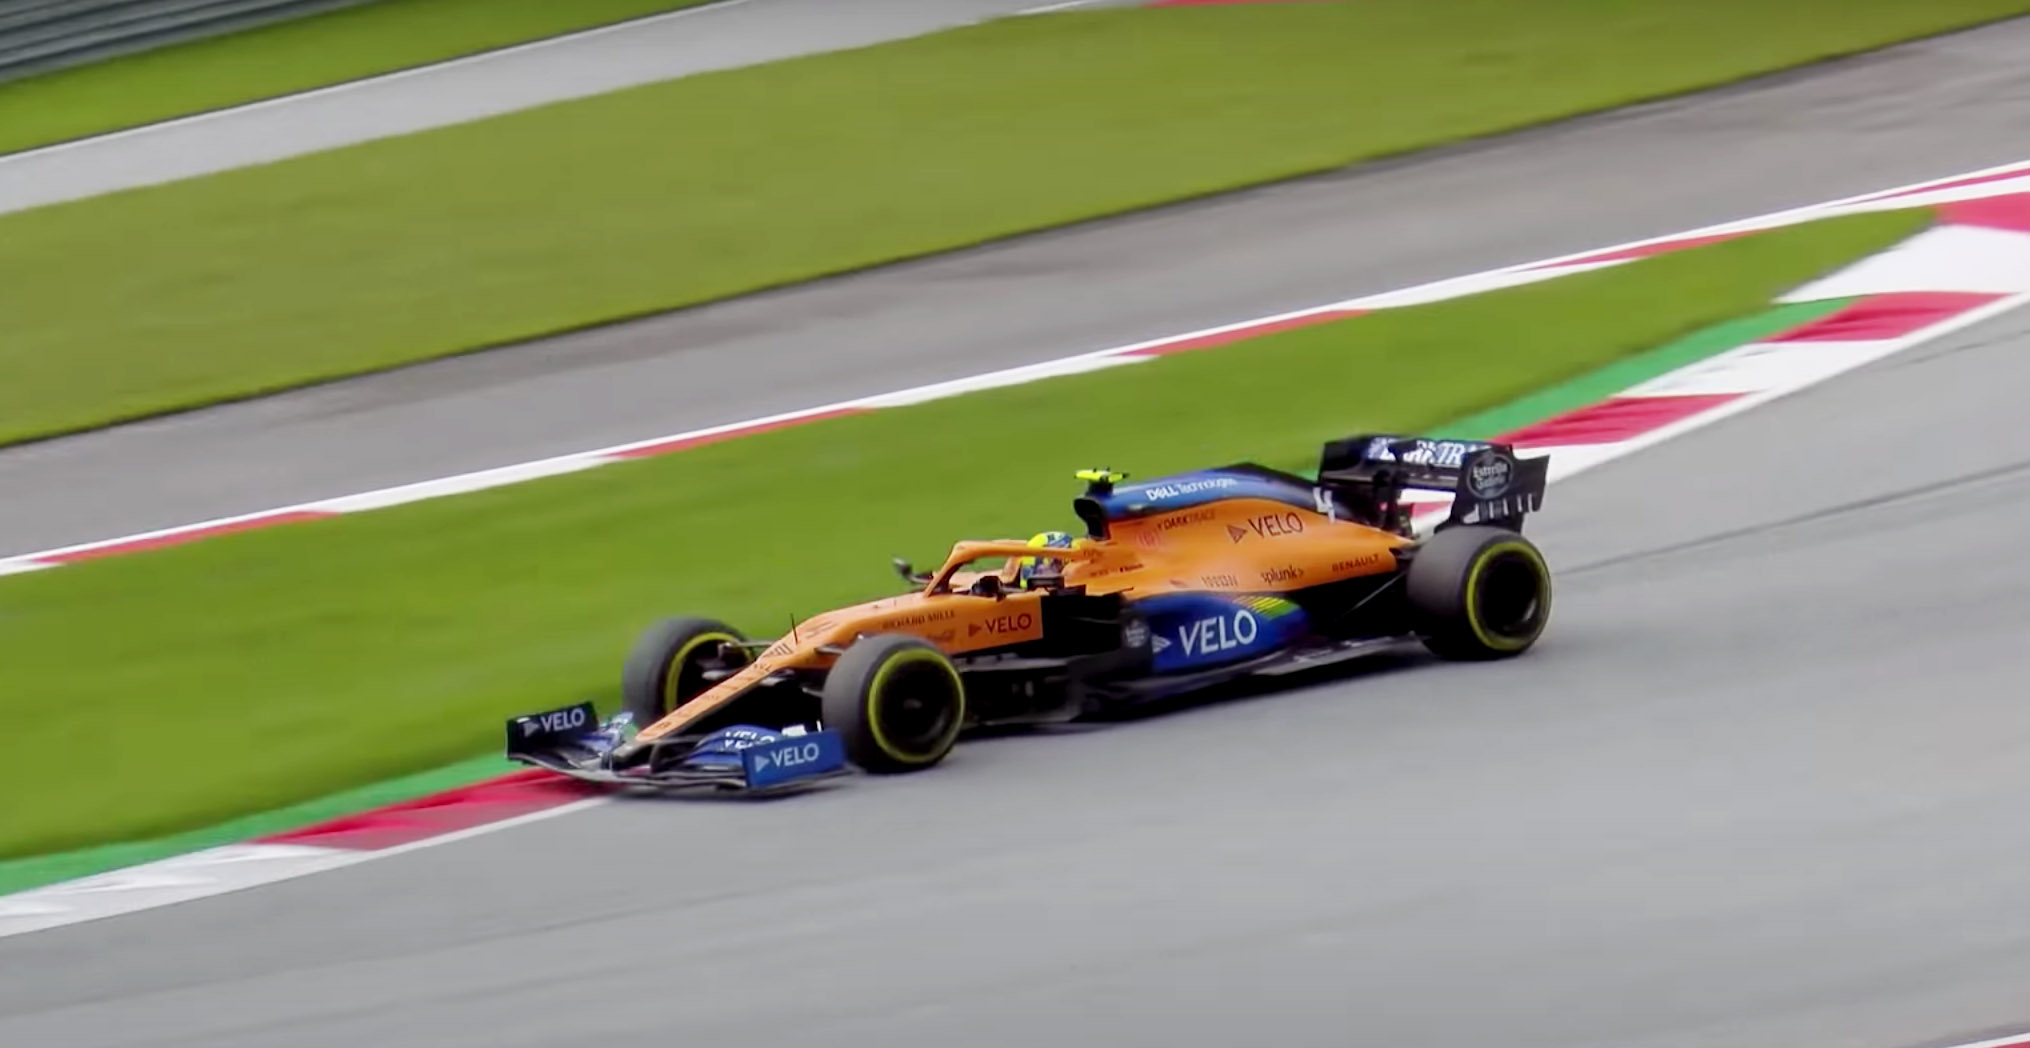 2020 Styrian Grand Prix